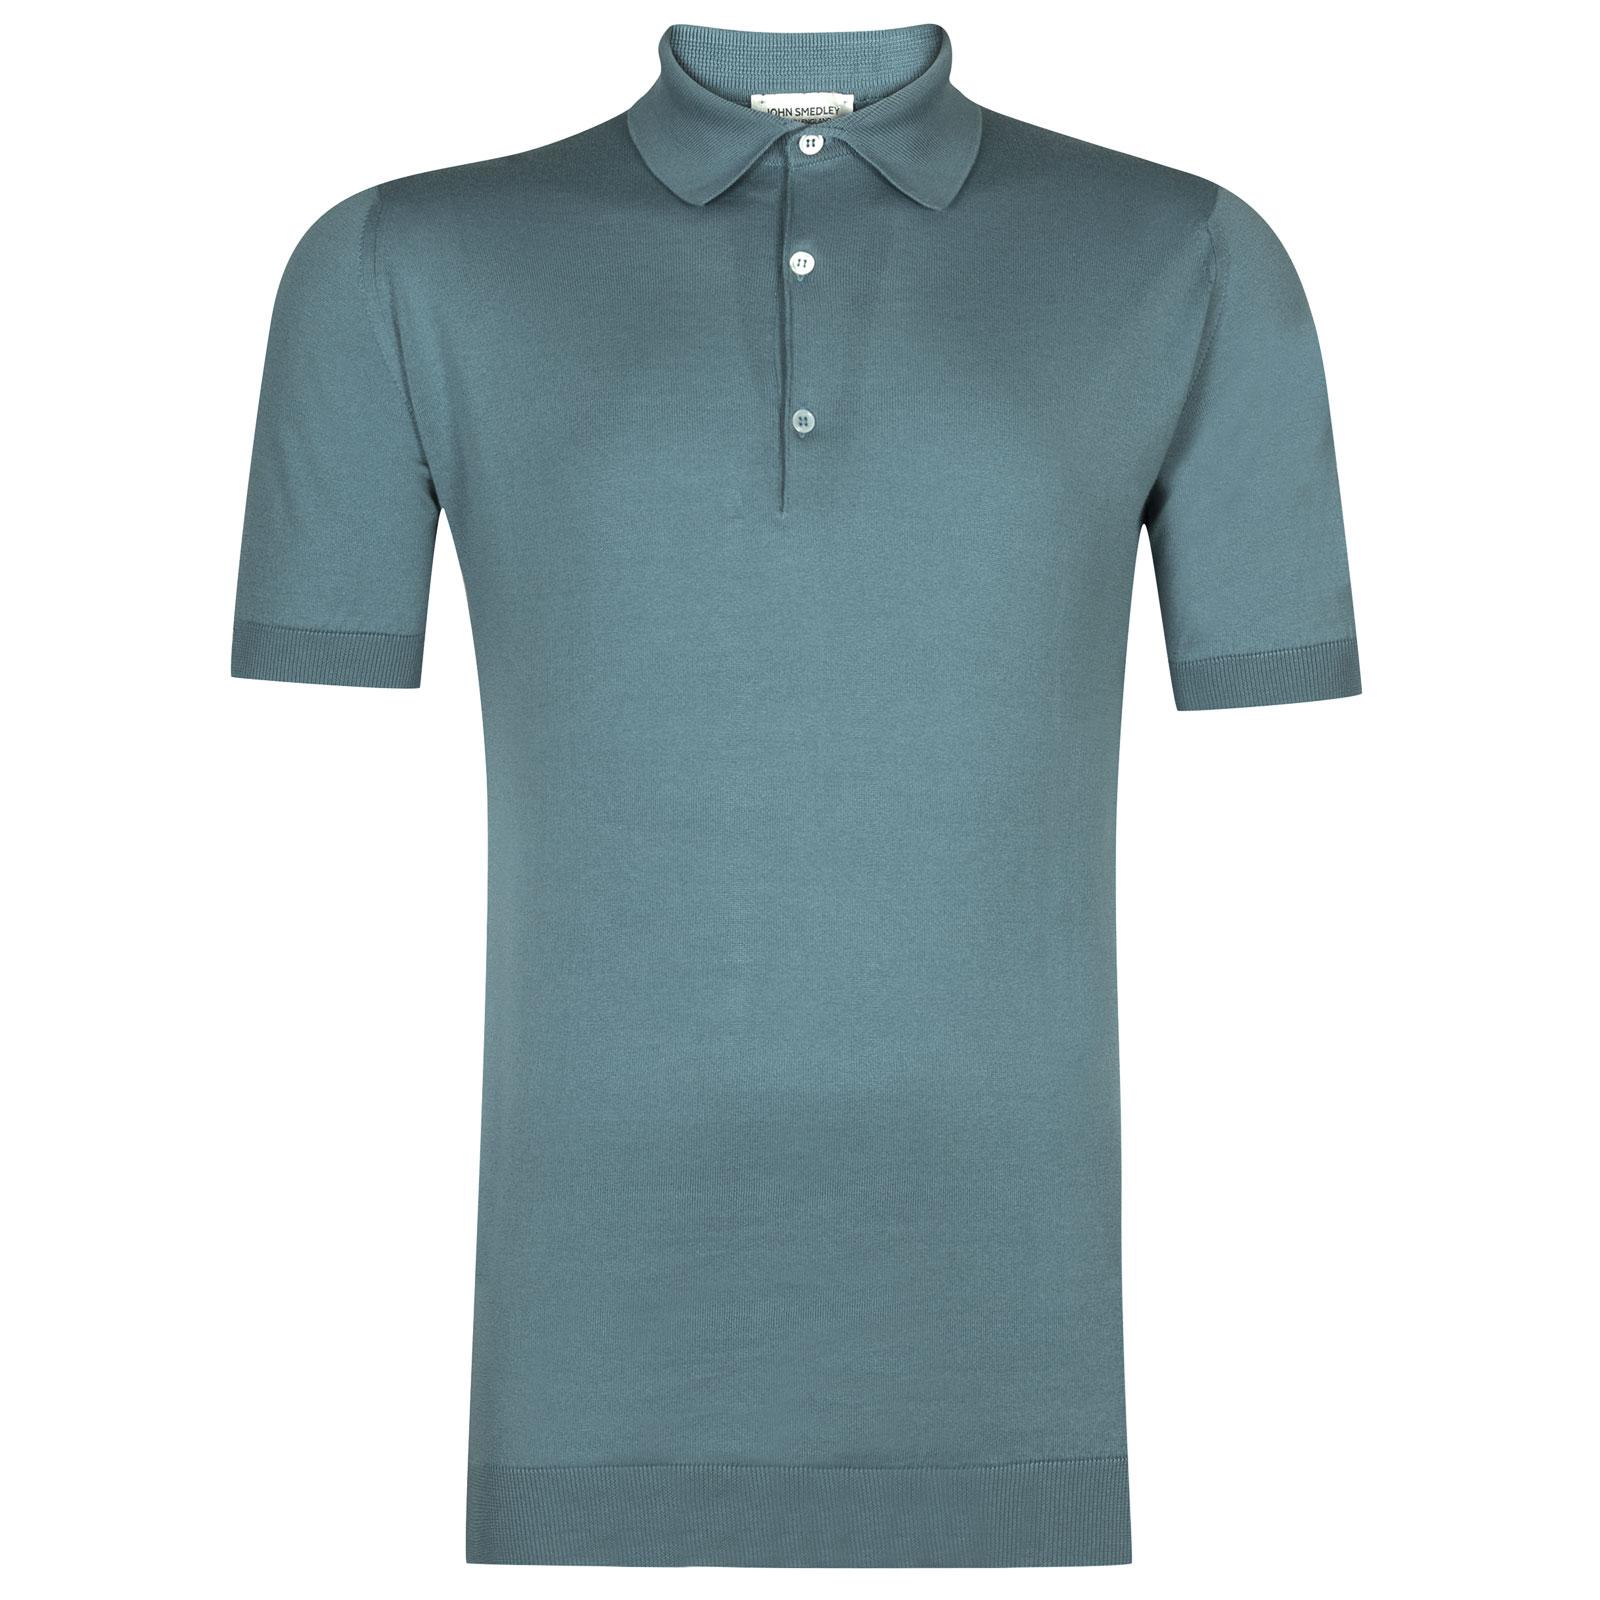 John Smedley adrian Sea Island Cotton Shirt in Summit Blue-S